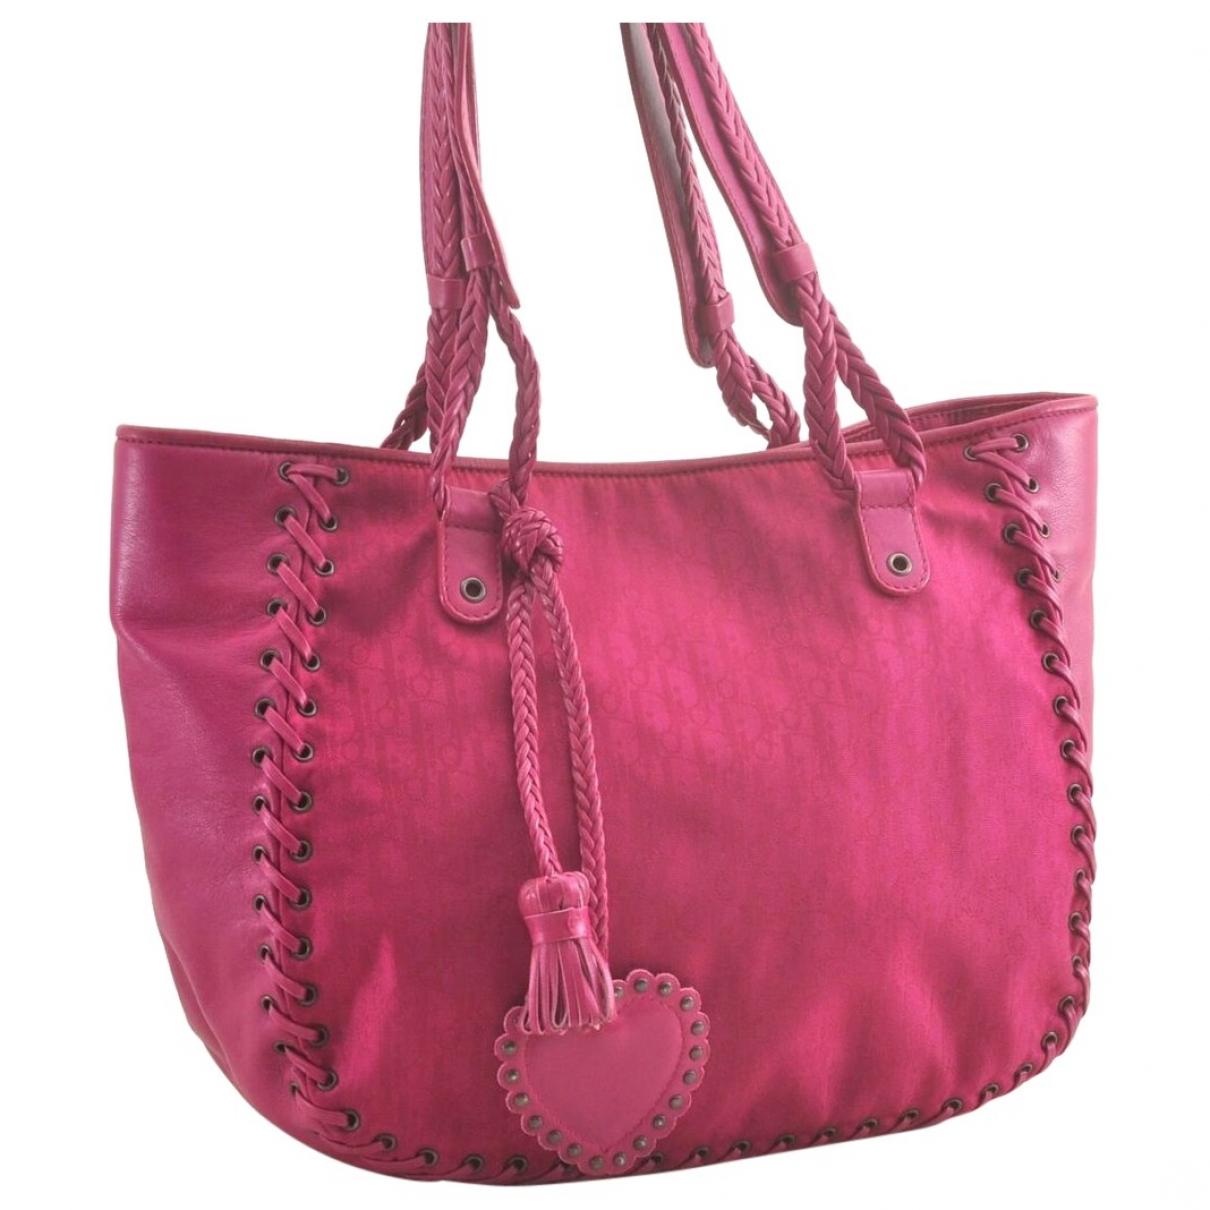 Dior \N Purple handbag for Women \N